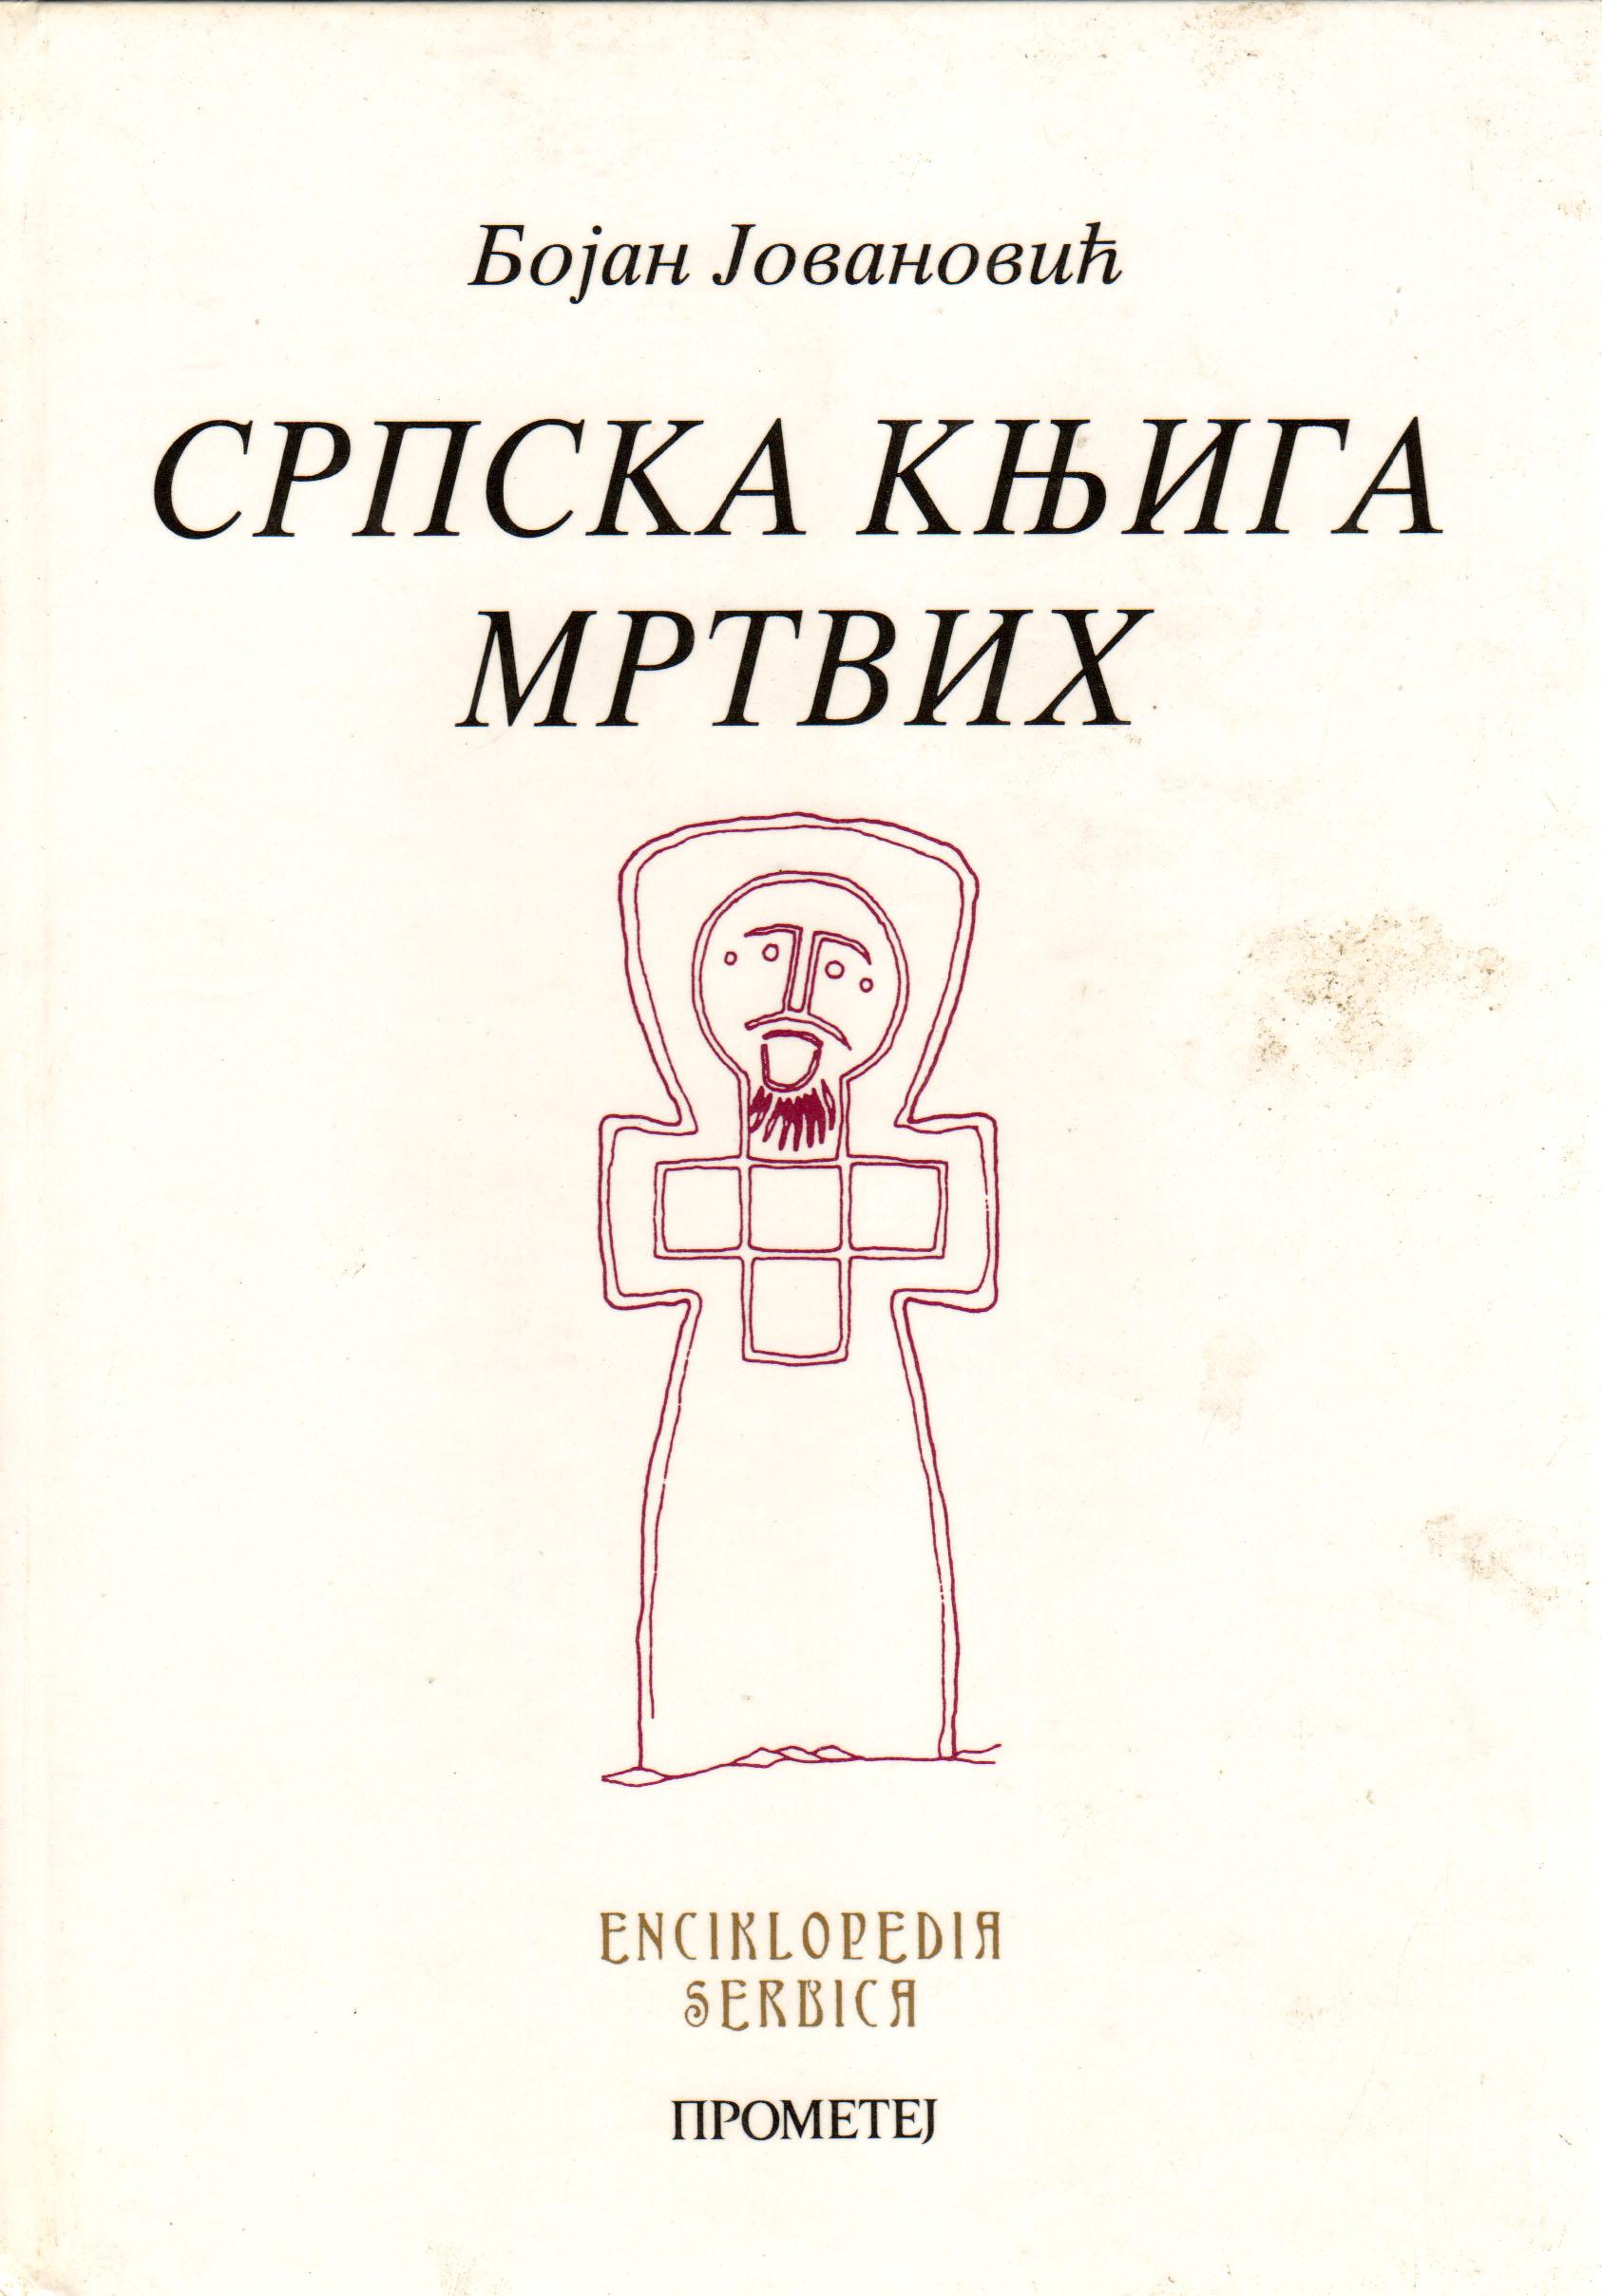 Srpska knjiga mrtvih